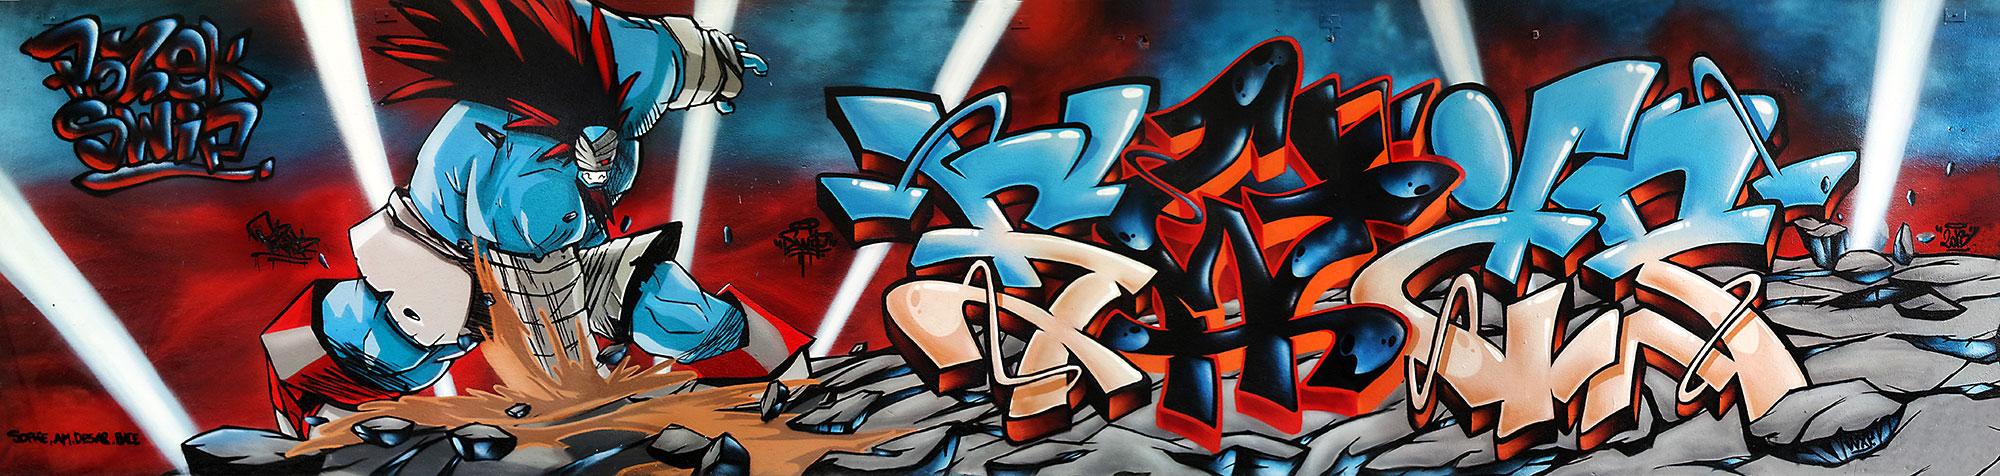 Ankama-graffiti-fresque-deco-graffiti-toulouse-swip-swiponer-wxp